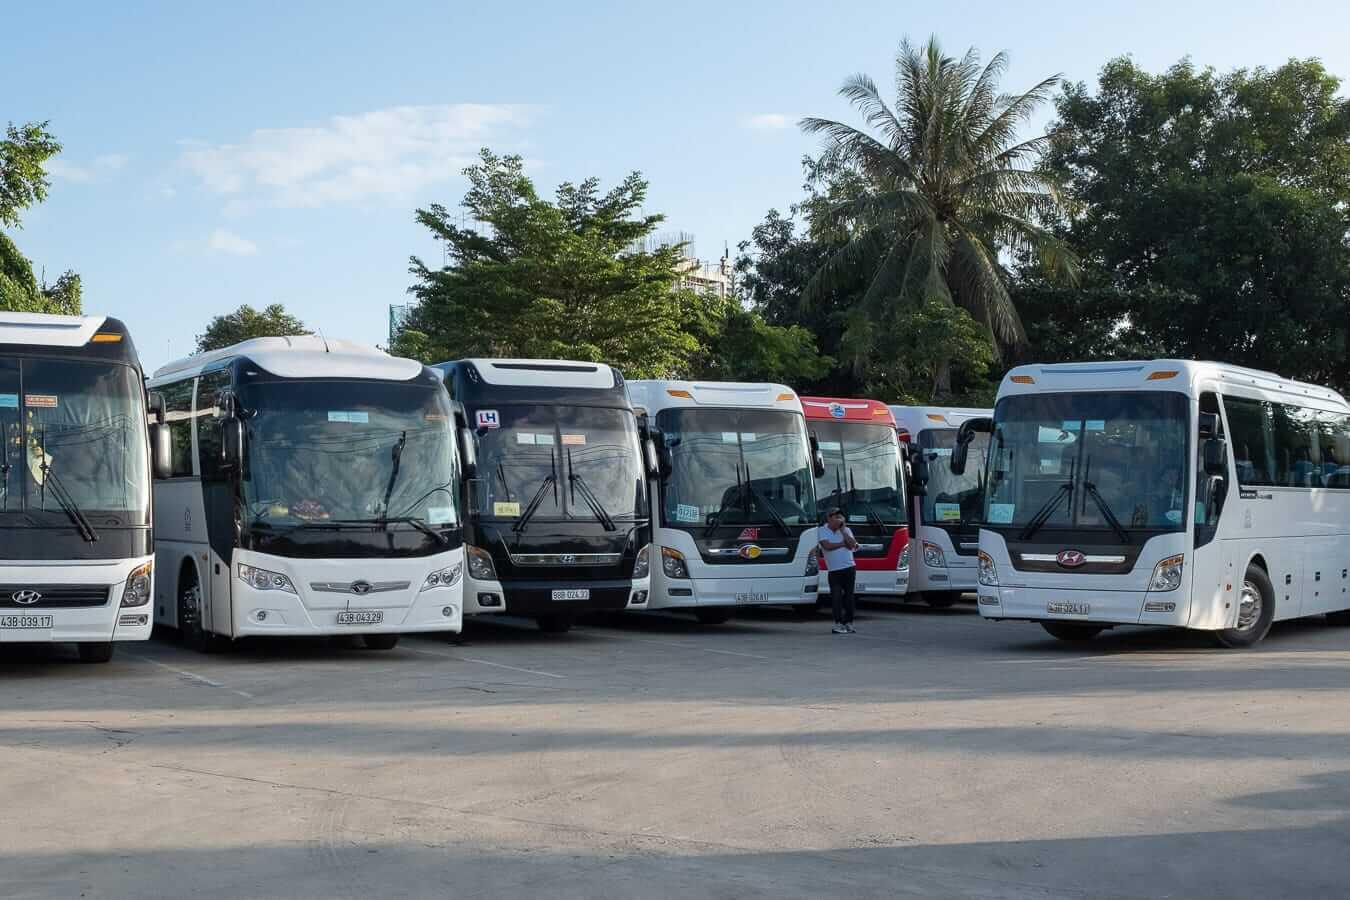 Hai Ba Trung bus depot: Hoi An bus station